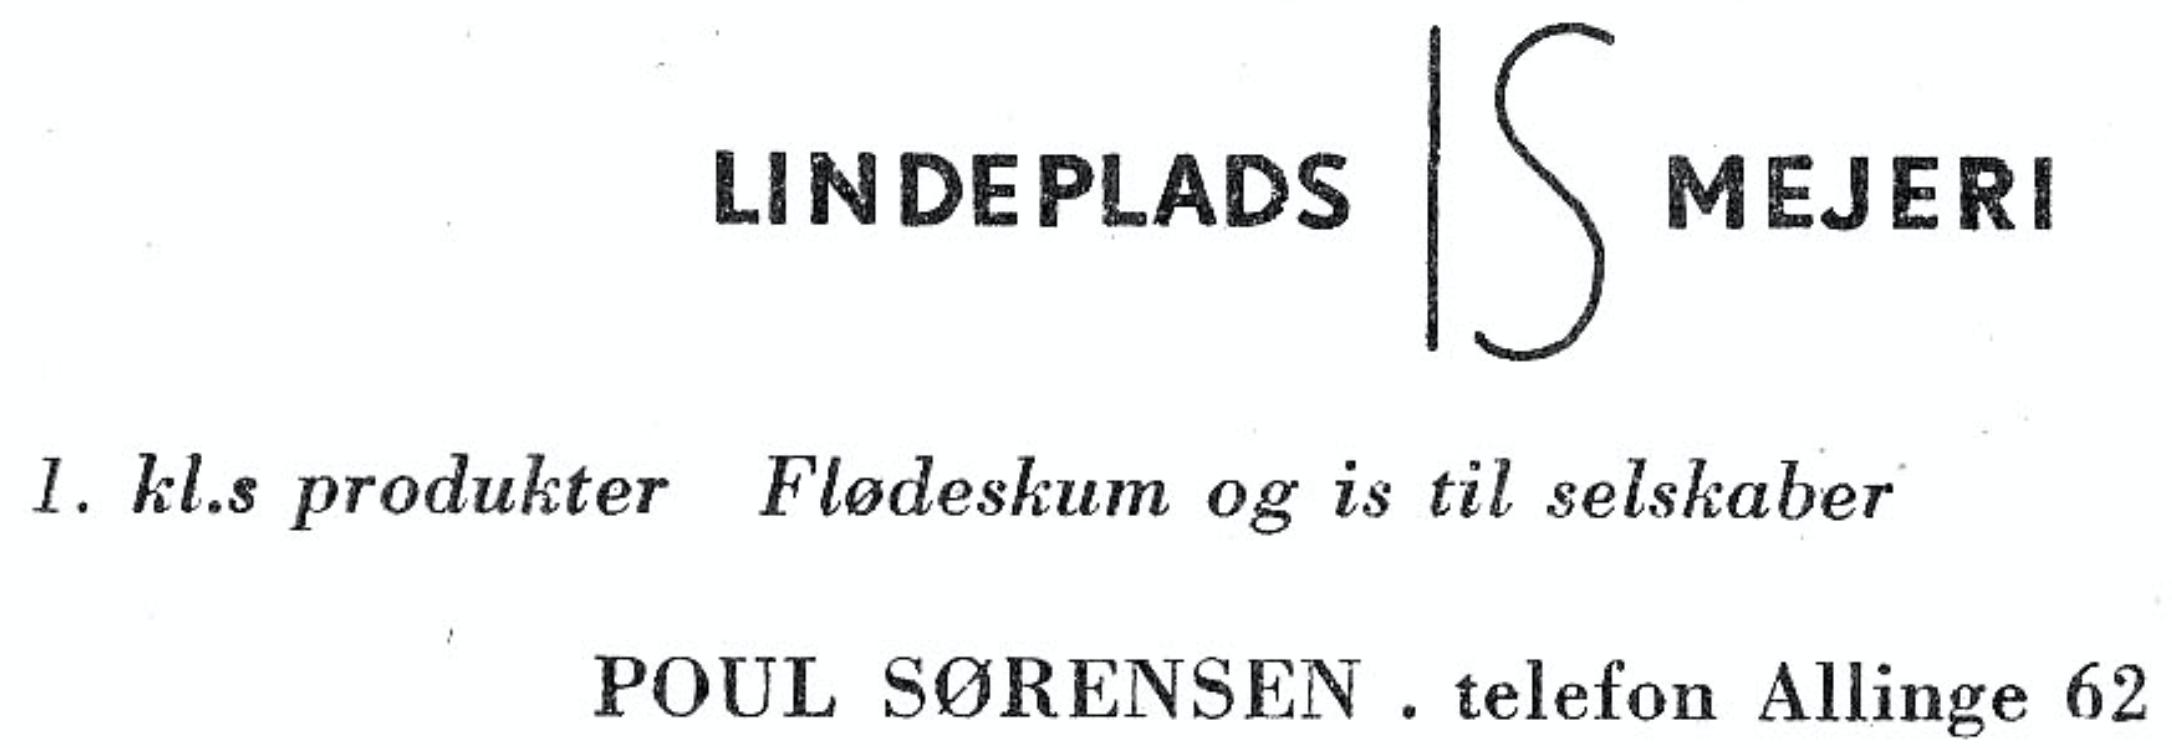 Lindeplads IS mejeri - 1958